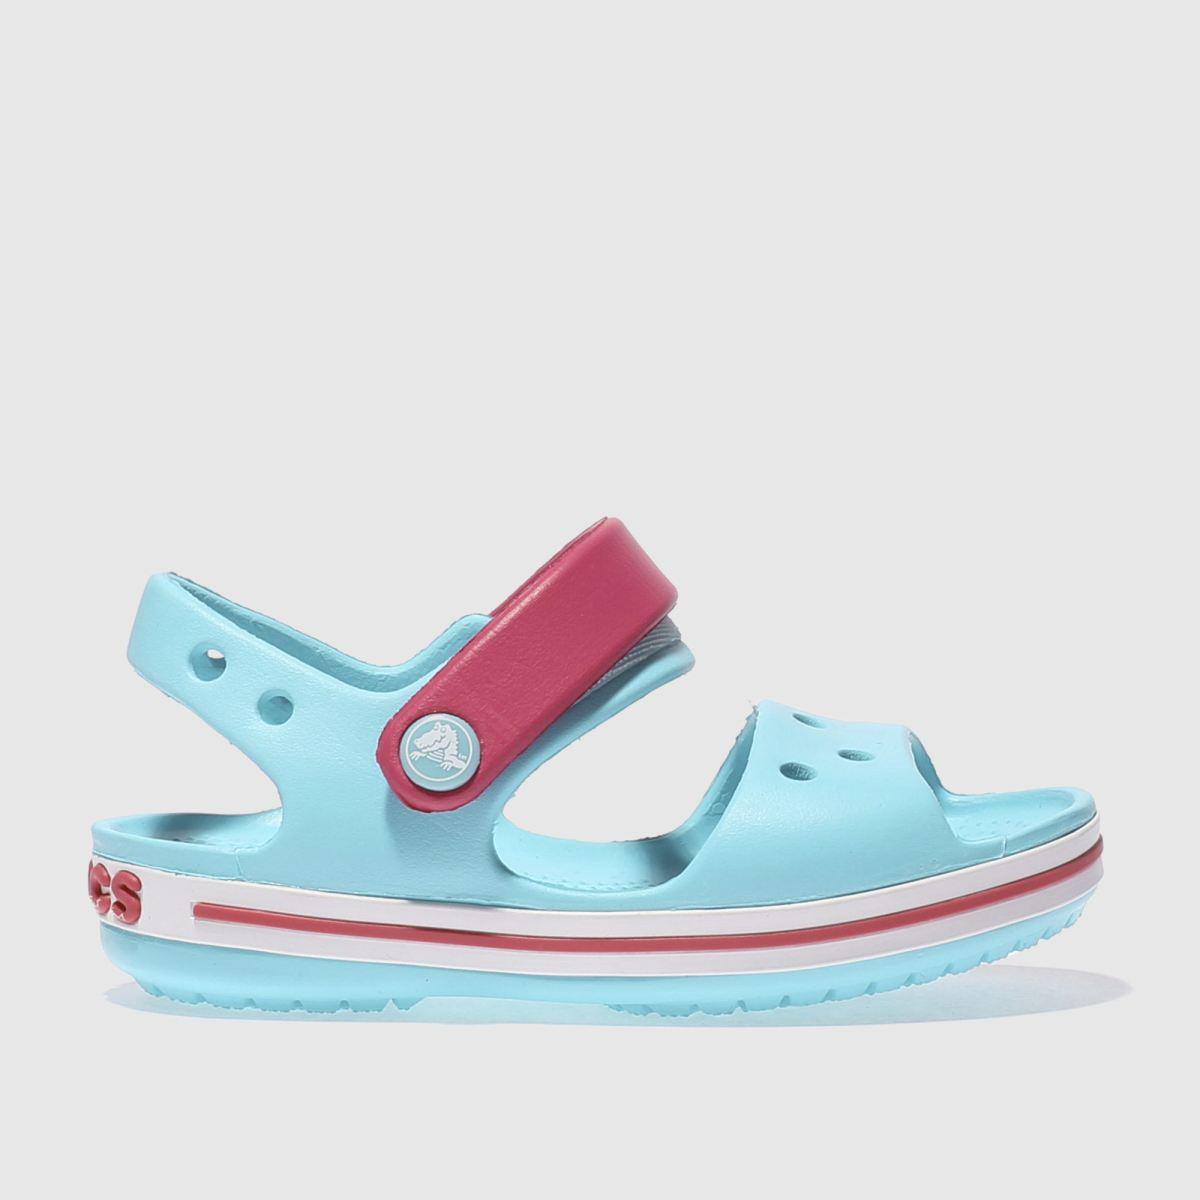 Crocs Pale Blue Crocband Sandal Trainers Toddler